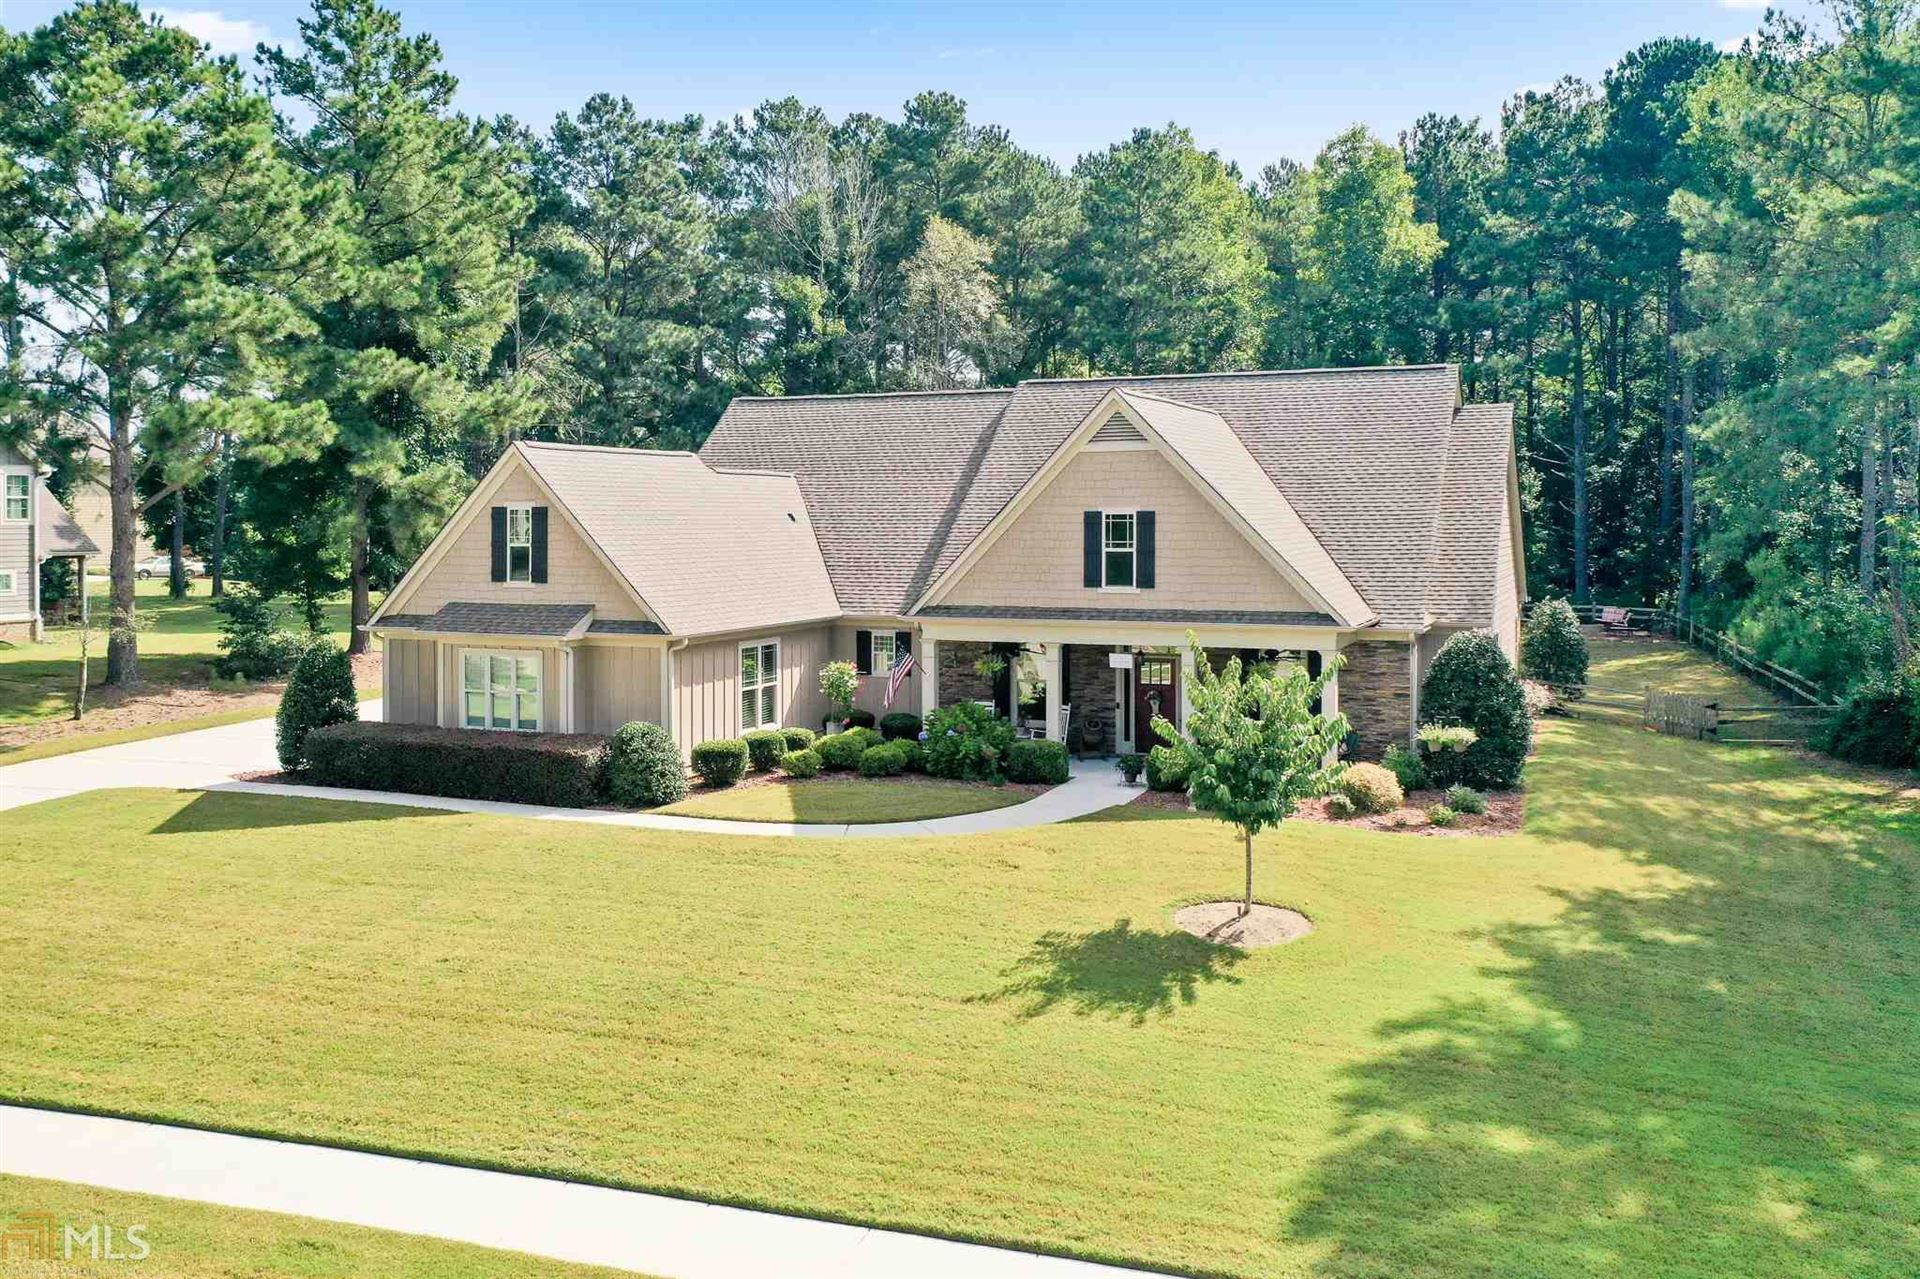 114 Waterlace Way, Fayetteville, GA 30215 - #: 8854443